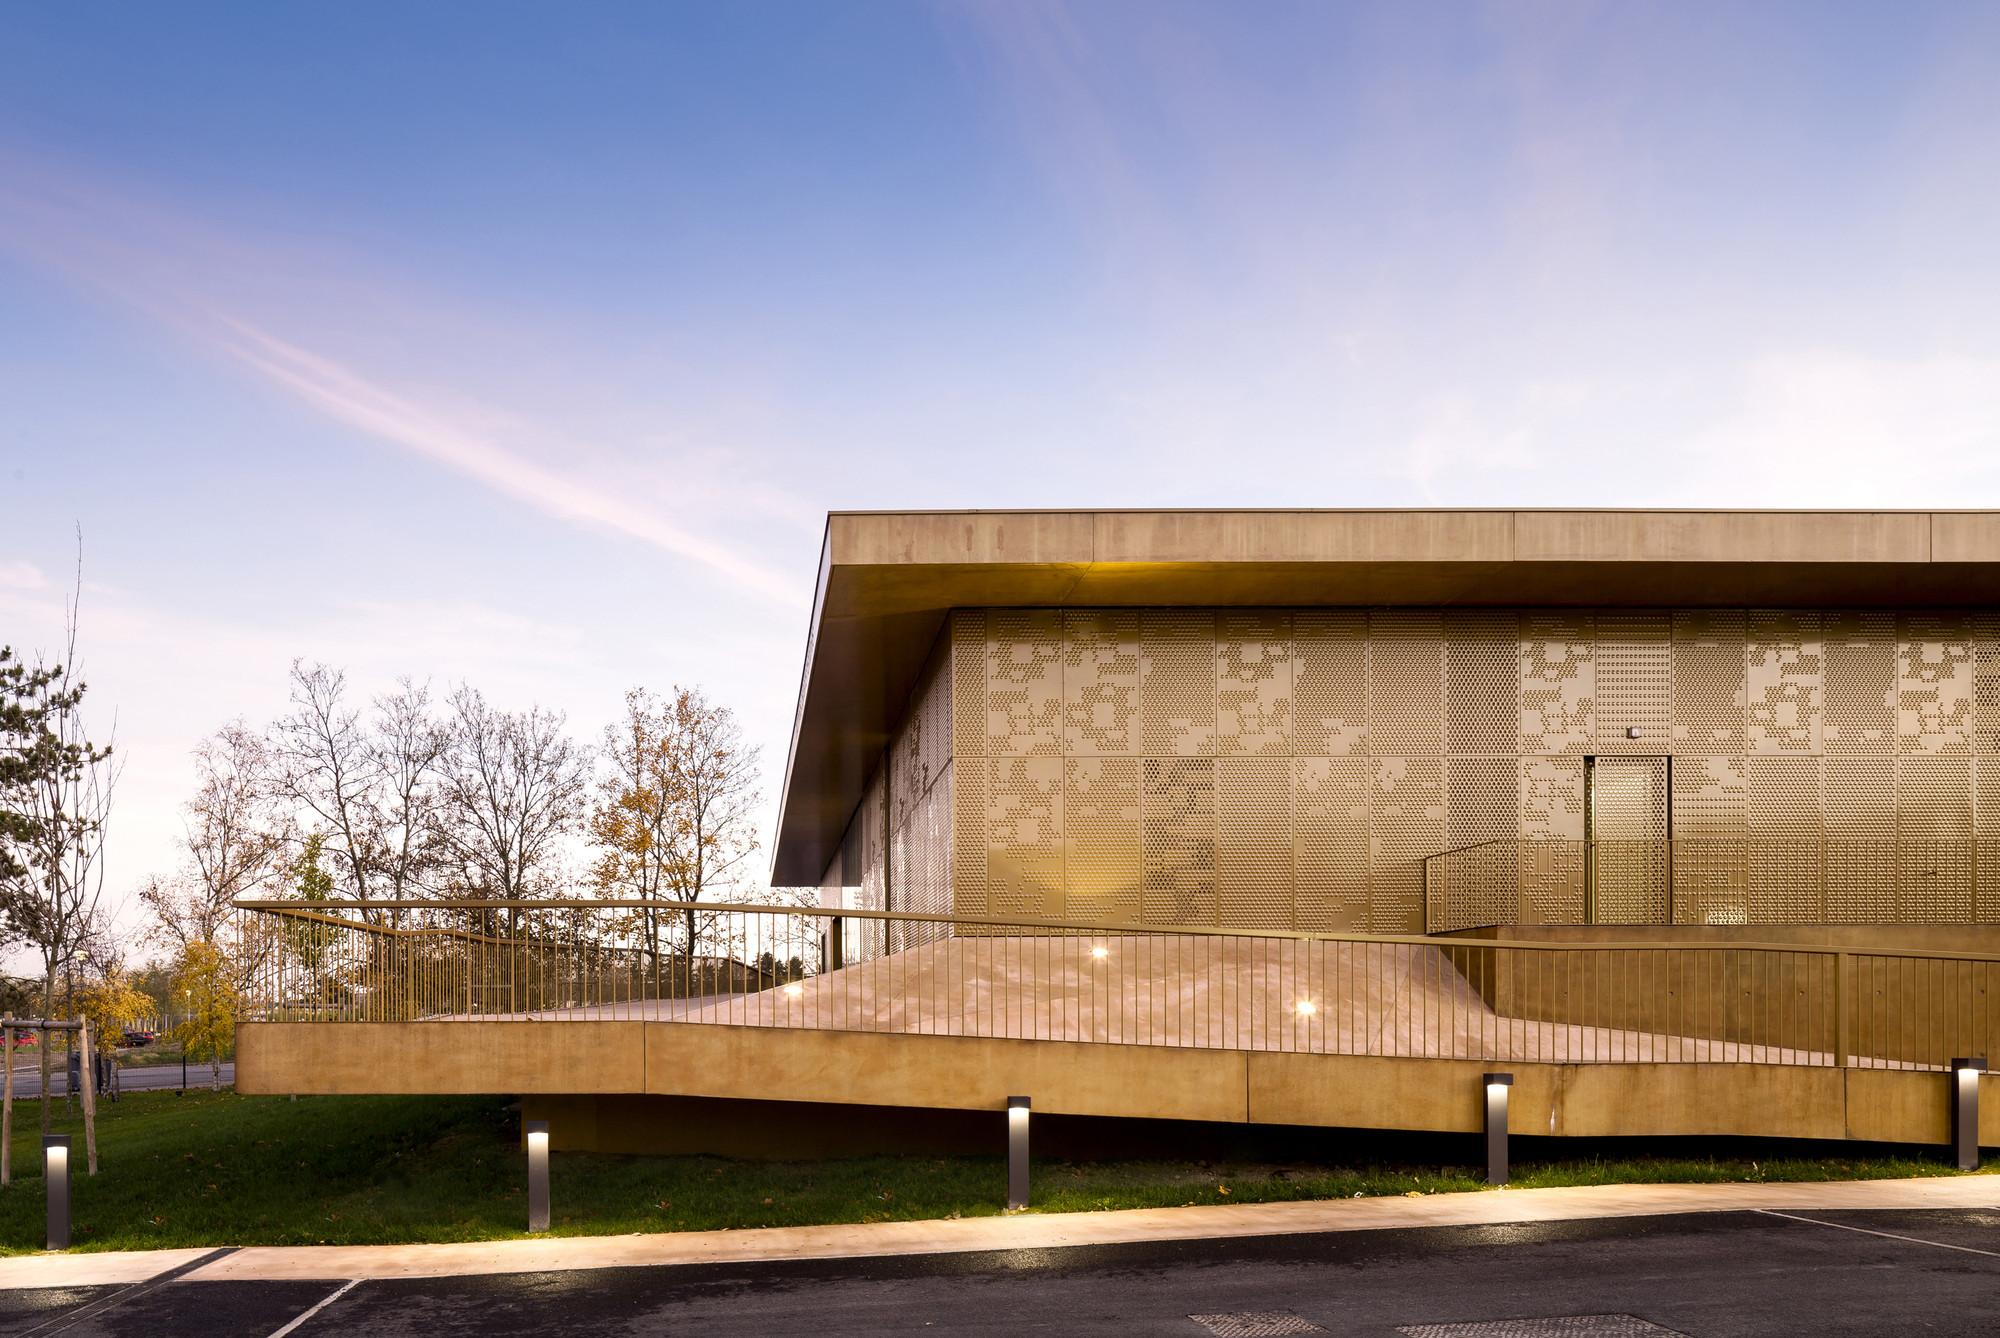 Arquivos Reims / Hamonic + Masson & Associés, © Sergio Grazia